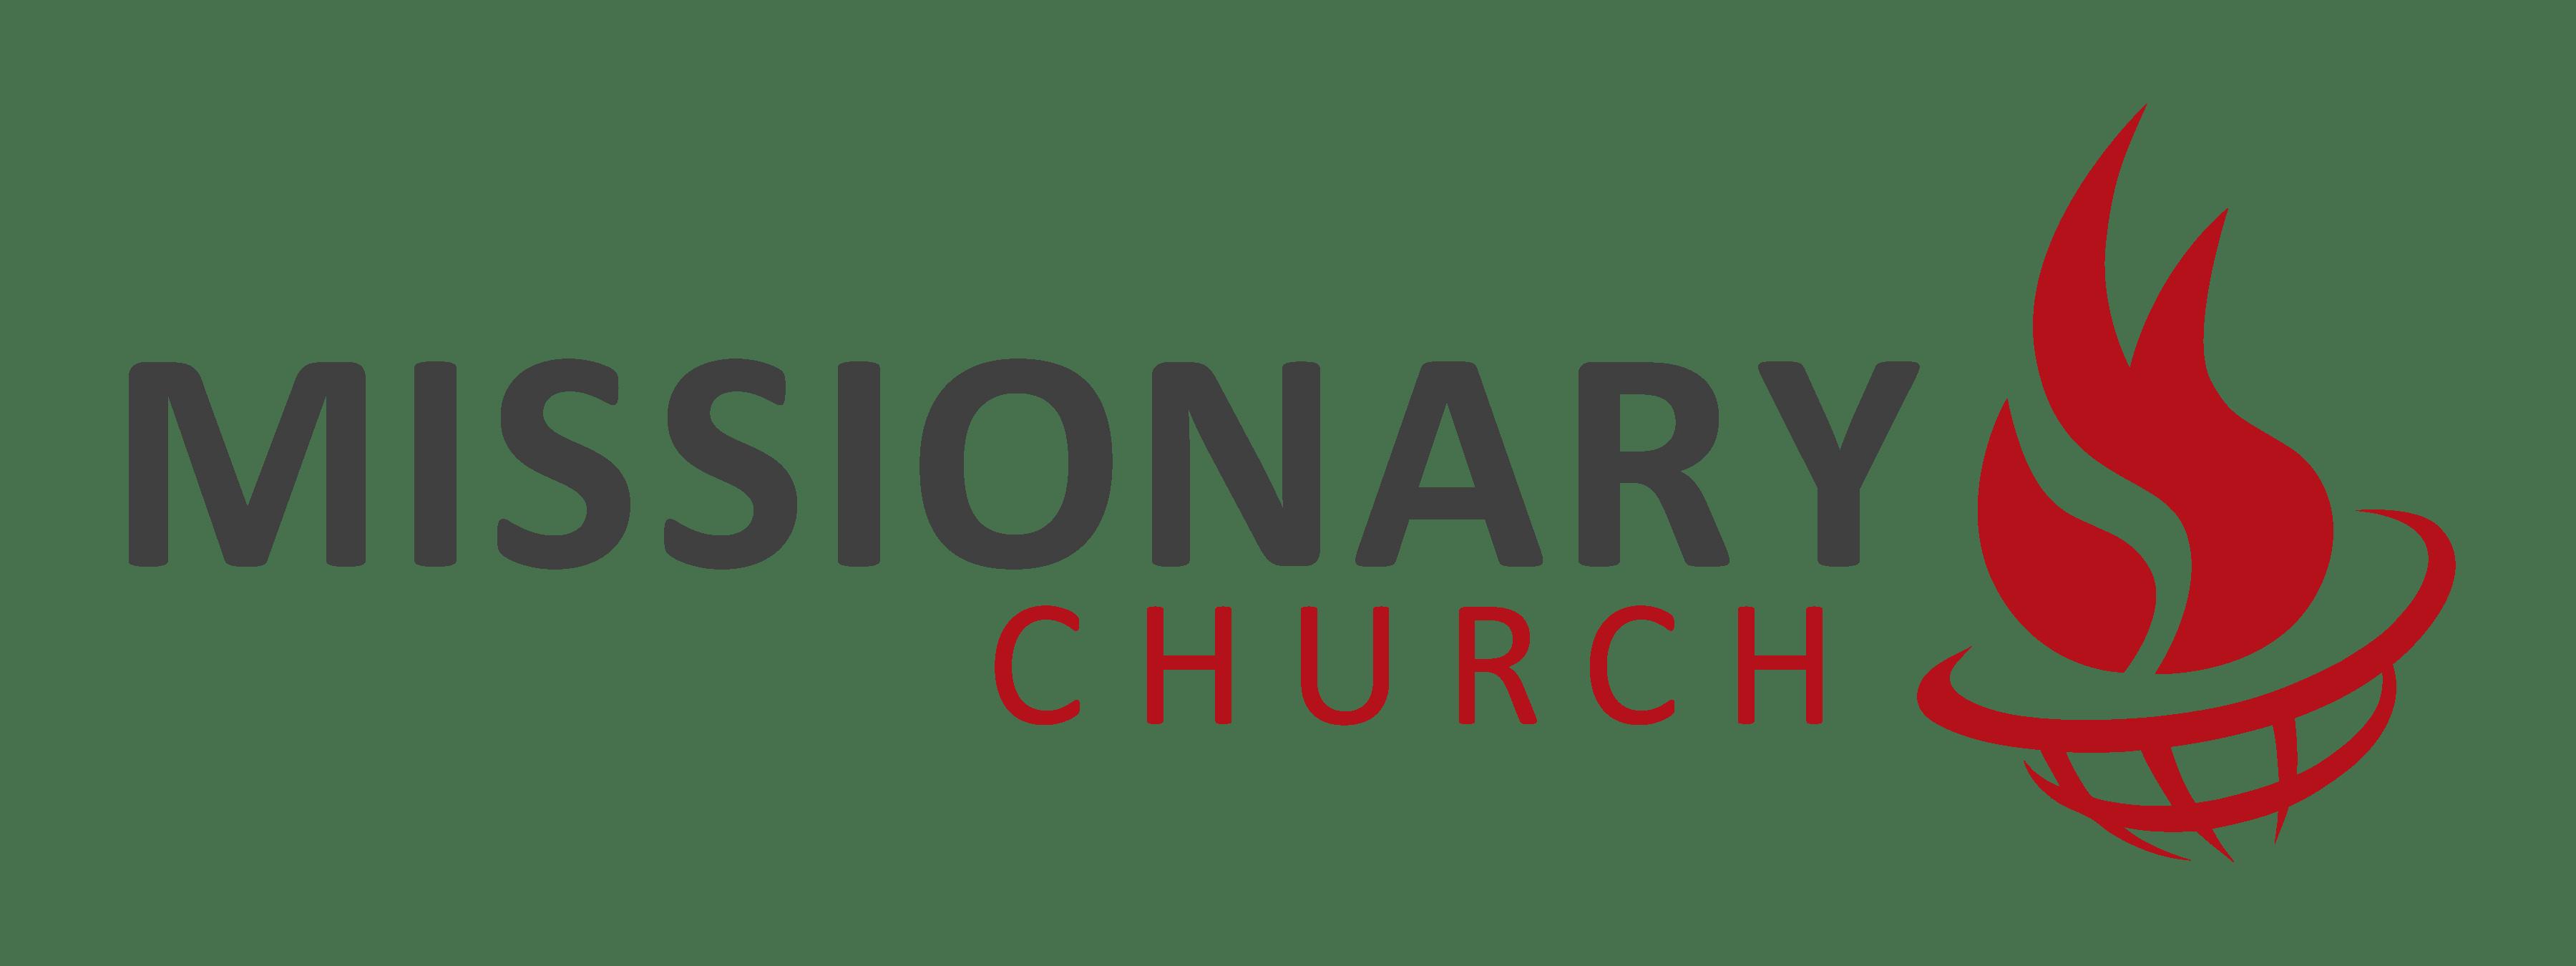 The Missionary Church logo